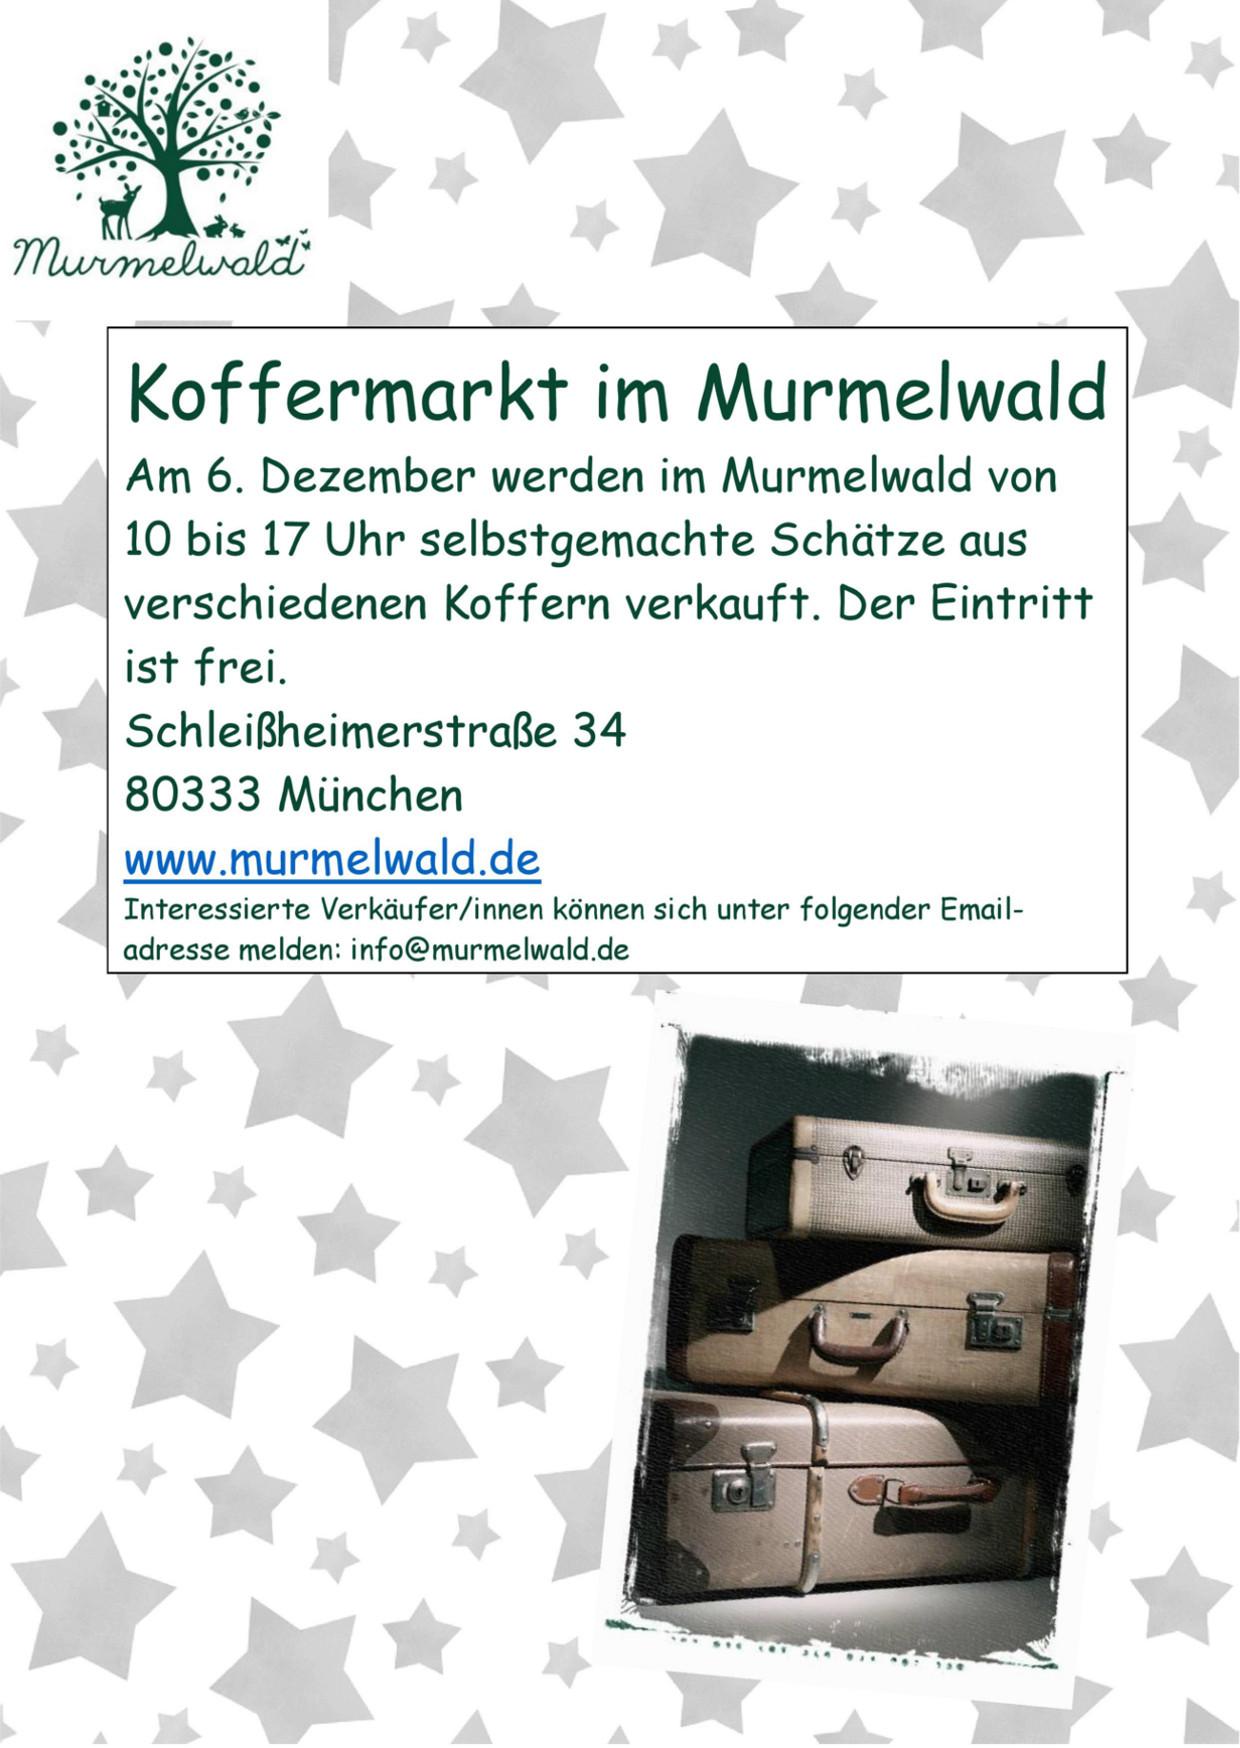 Murmelwald Koffermarkt